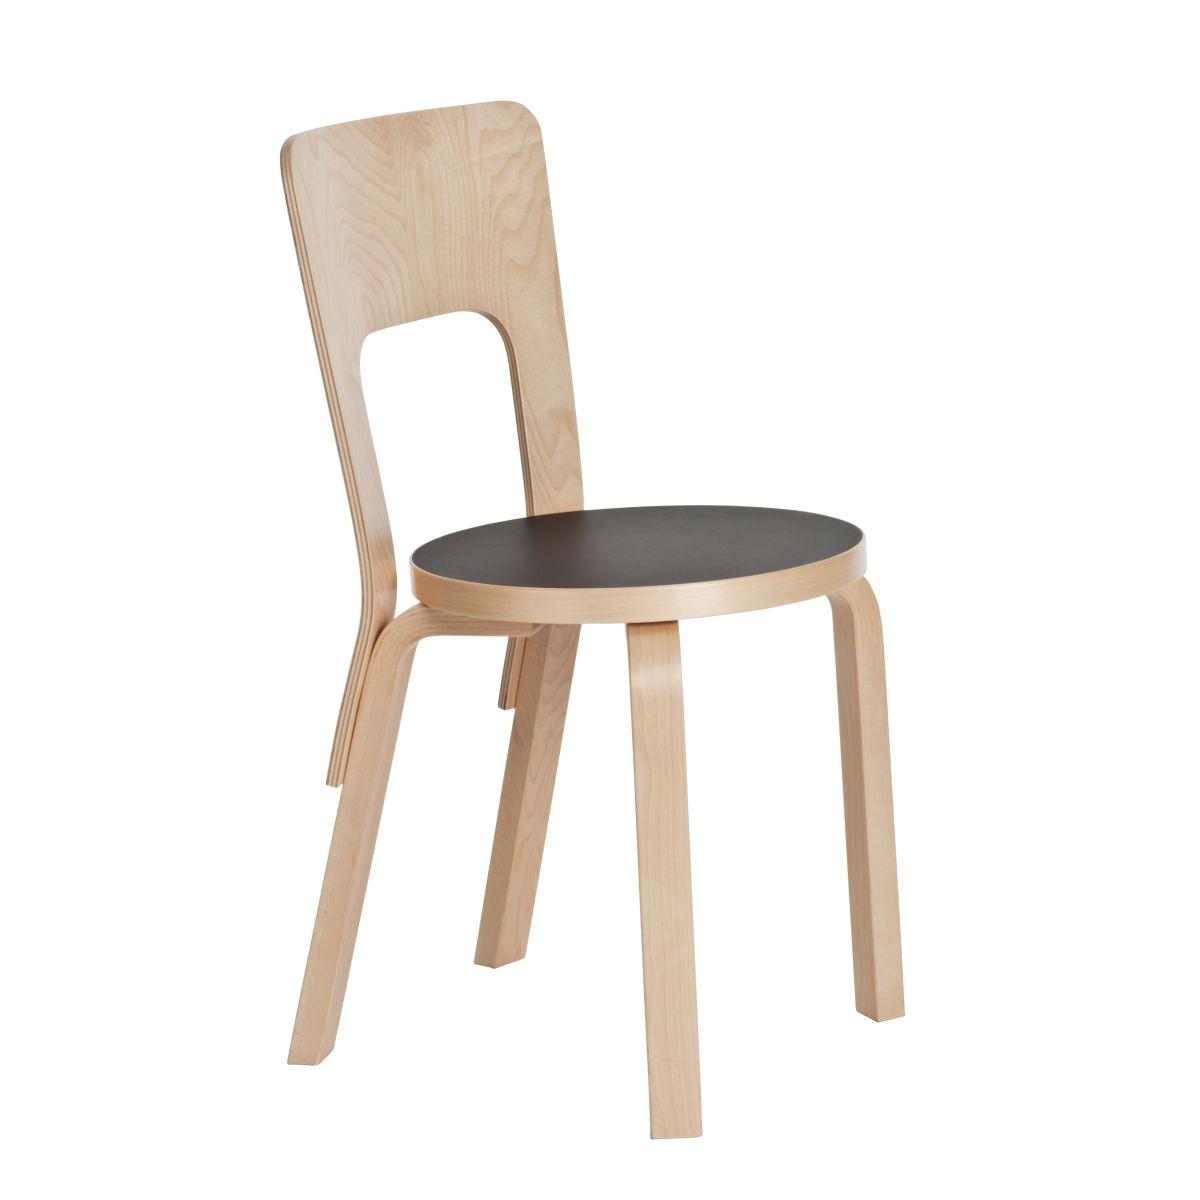 Chair-66-Clear-Lacquer-Black-Linoleum